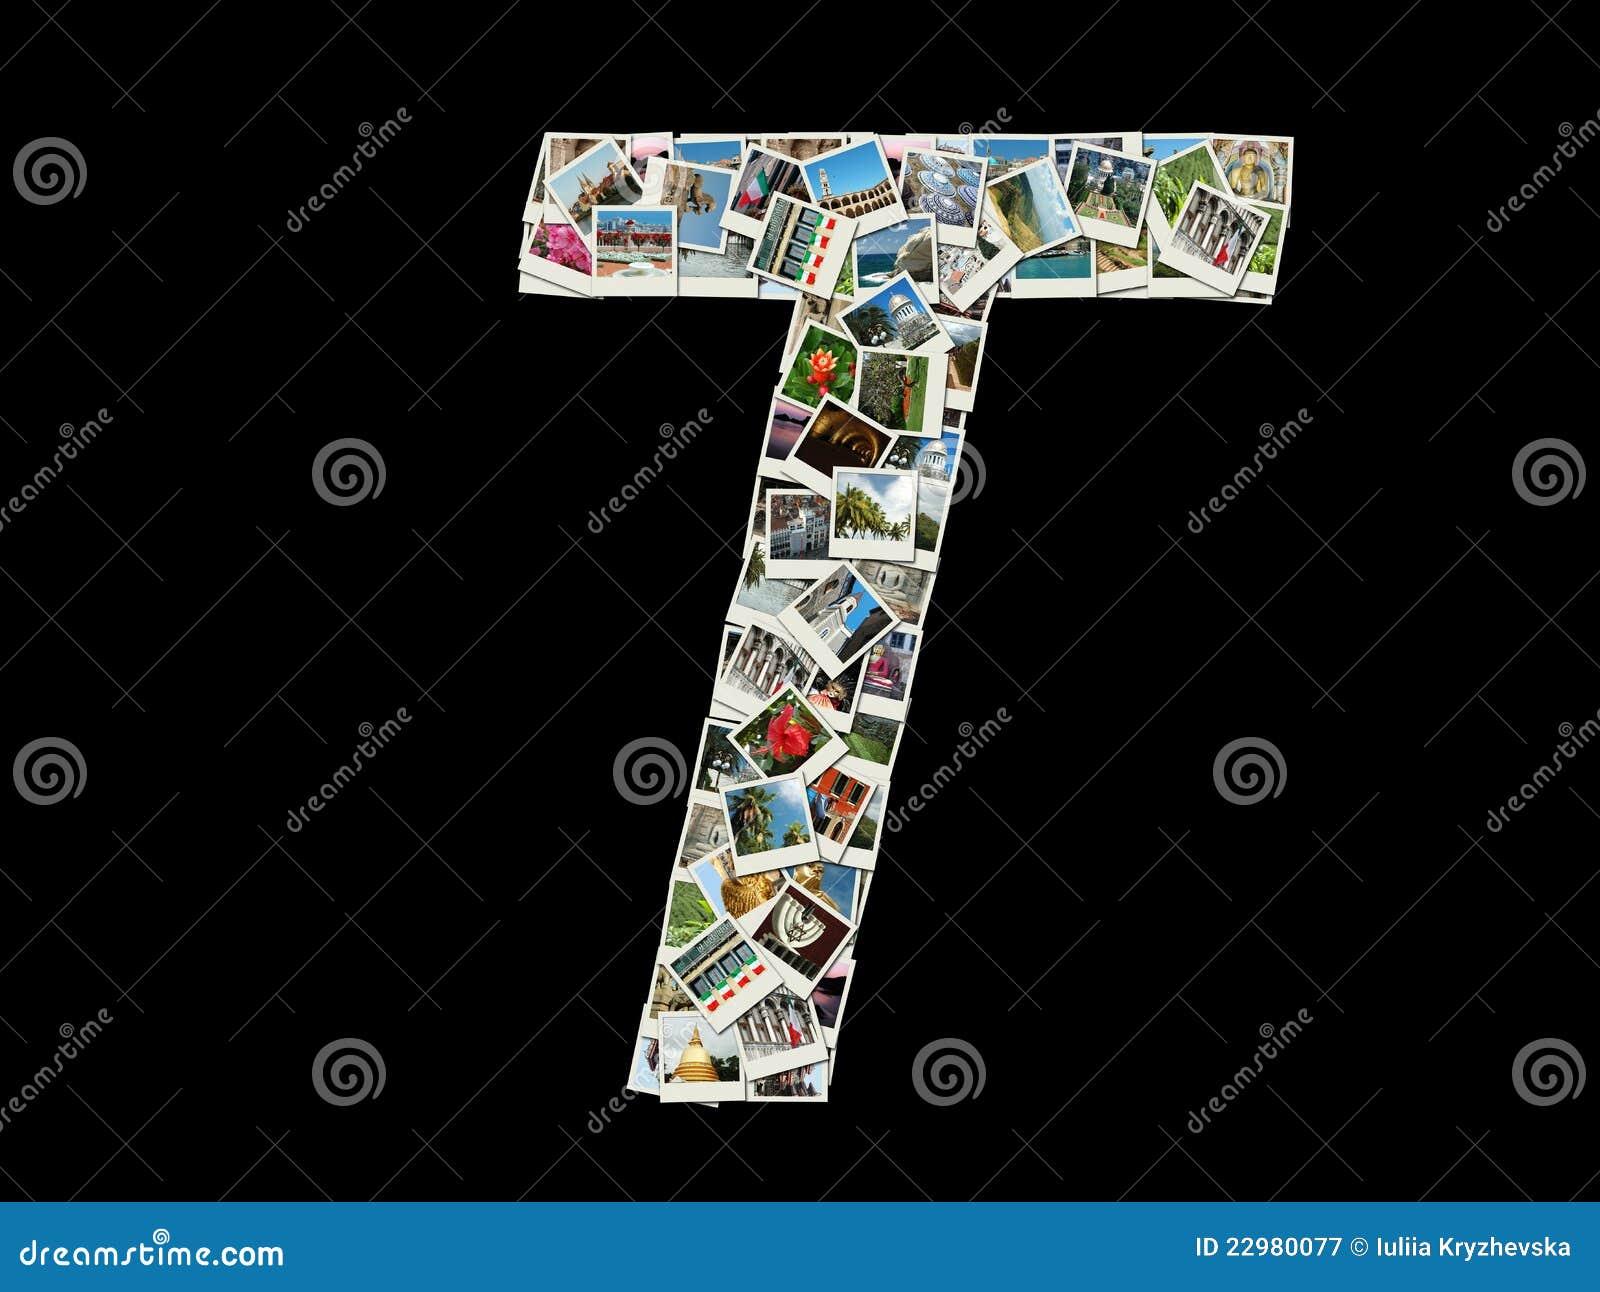 Письмо t - коллаж фото перемещения